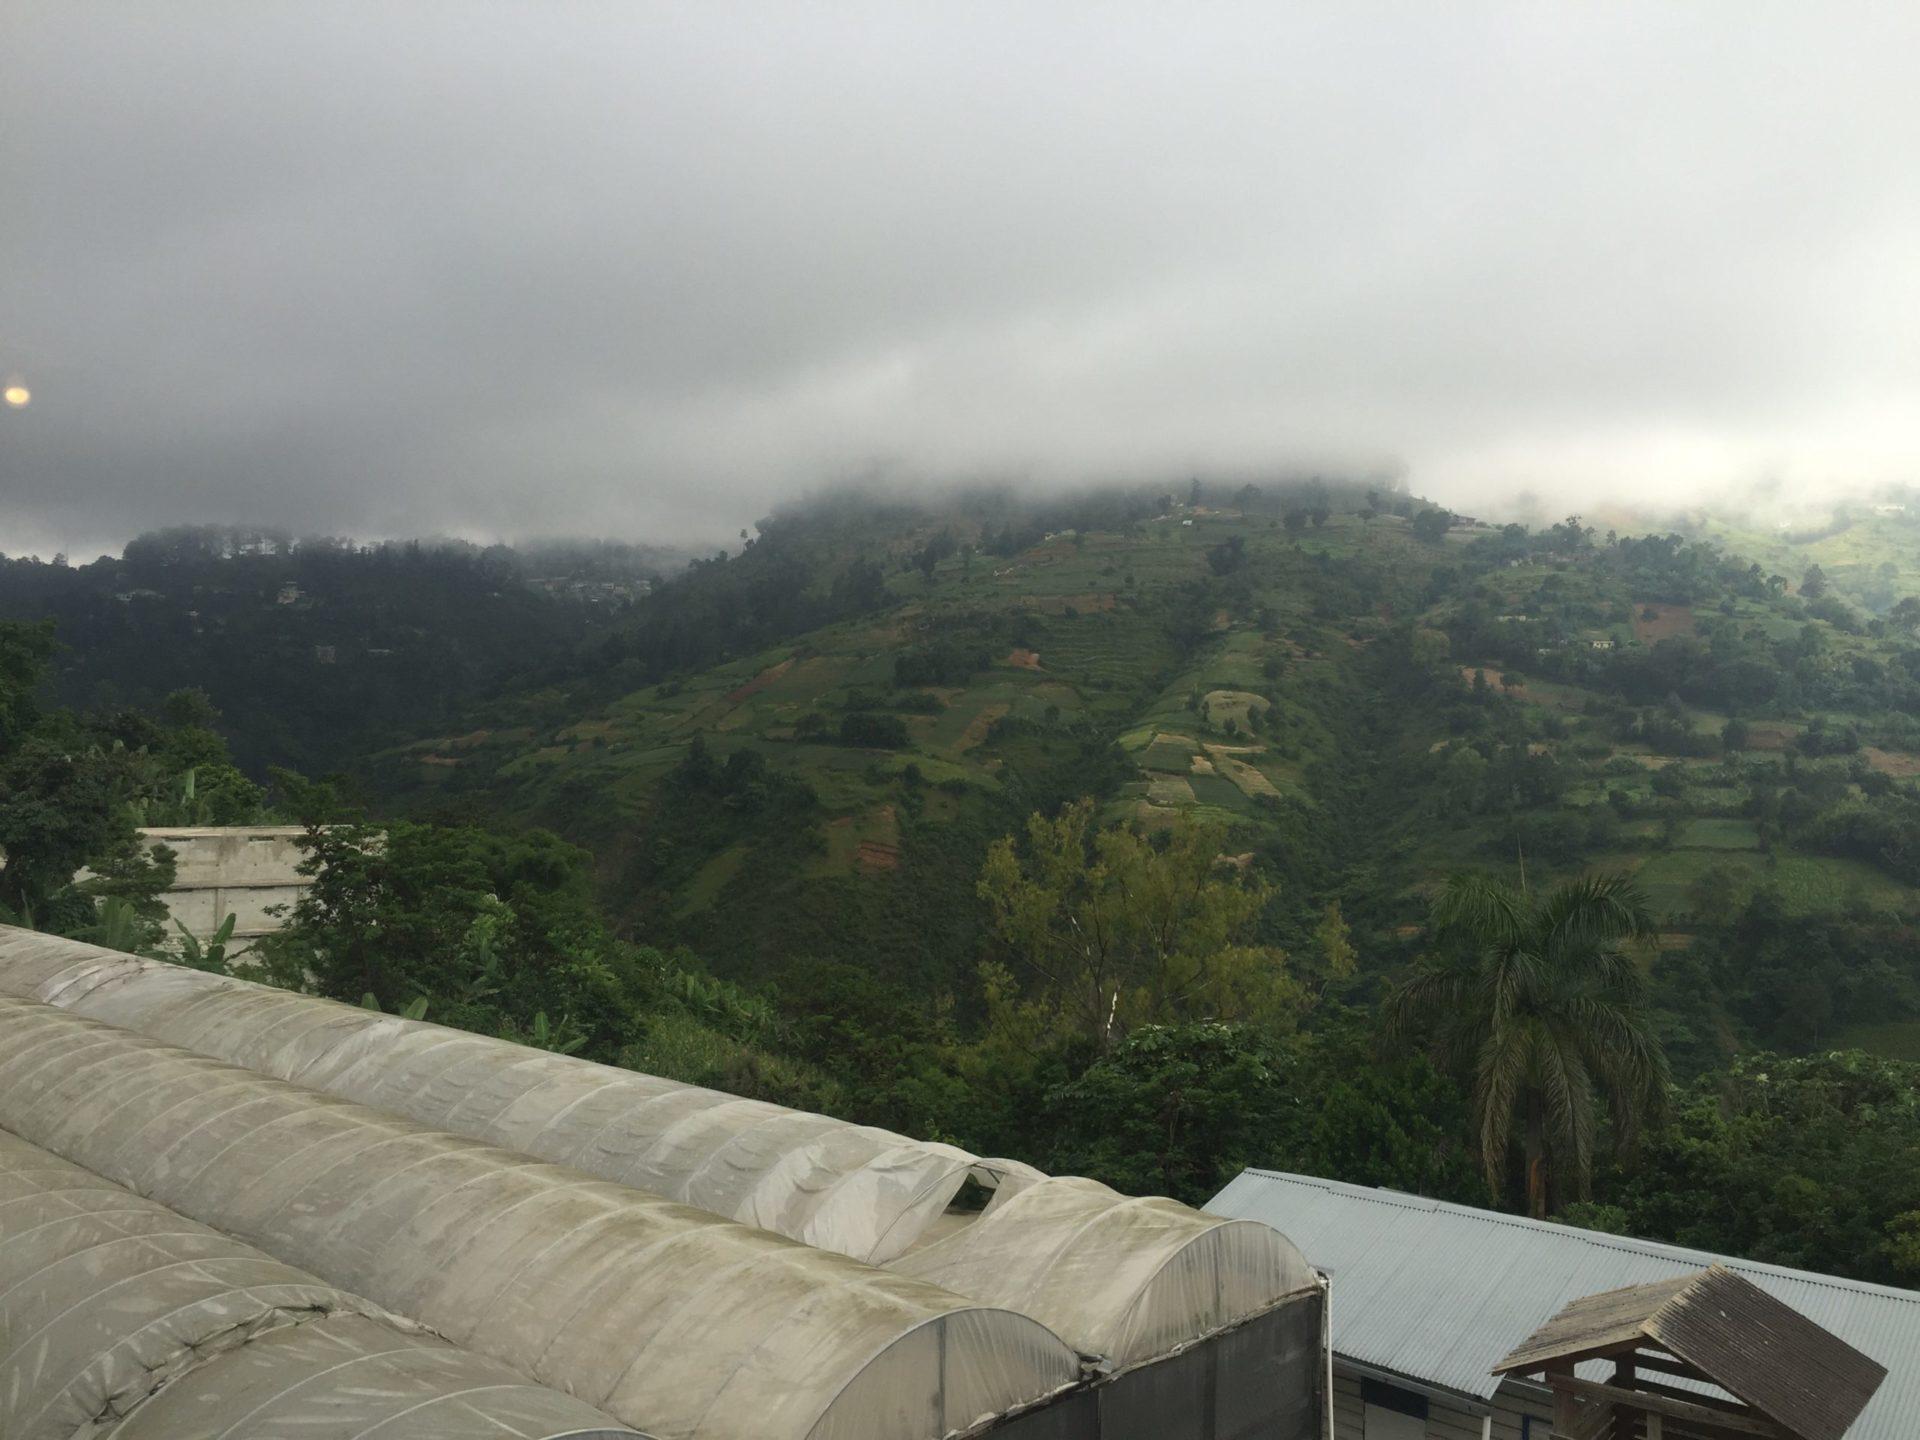 View of Farmland from Farmouth